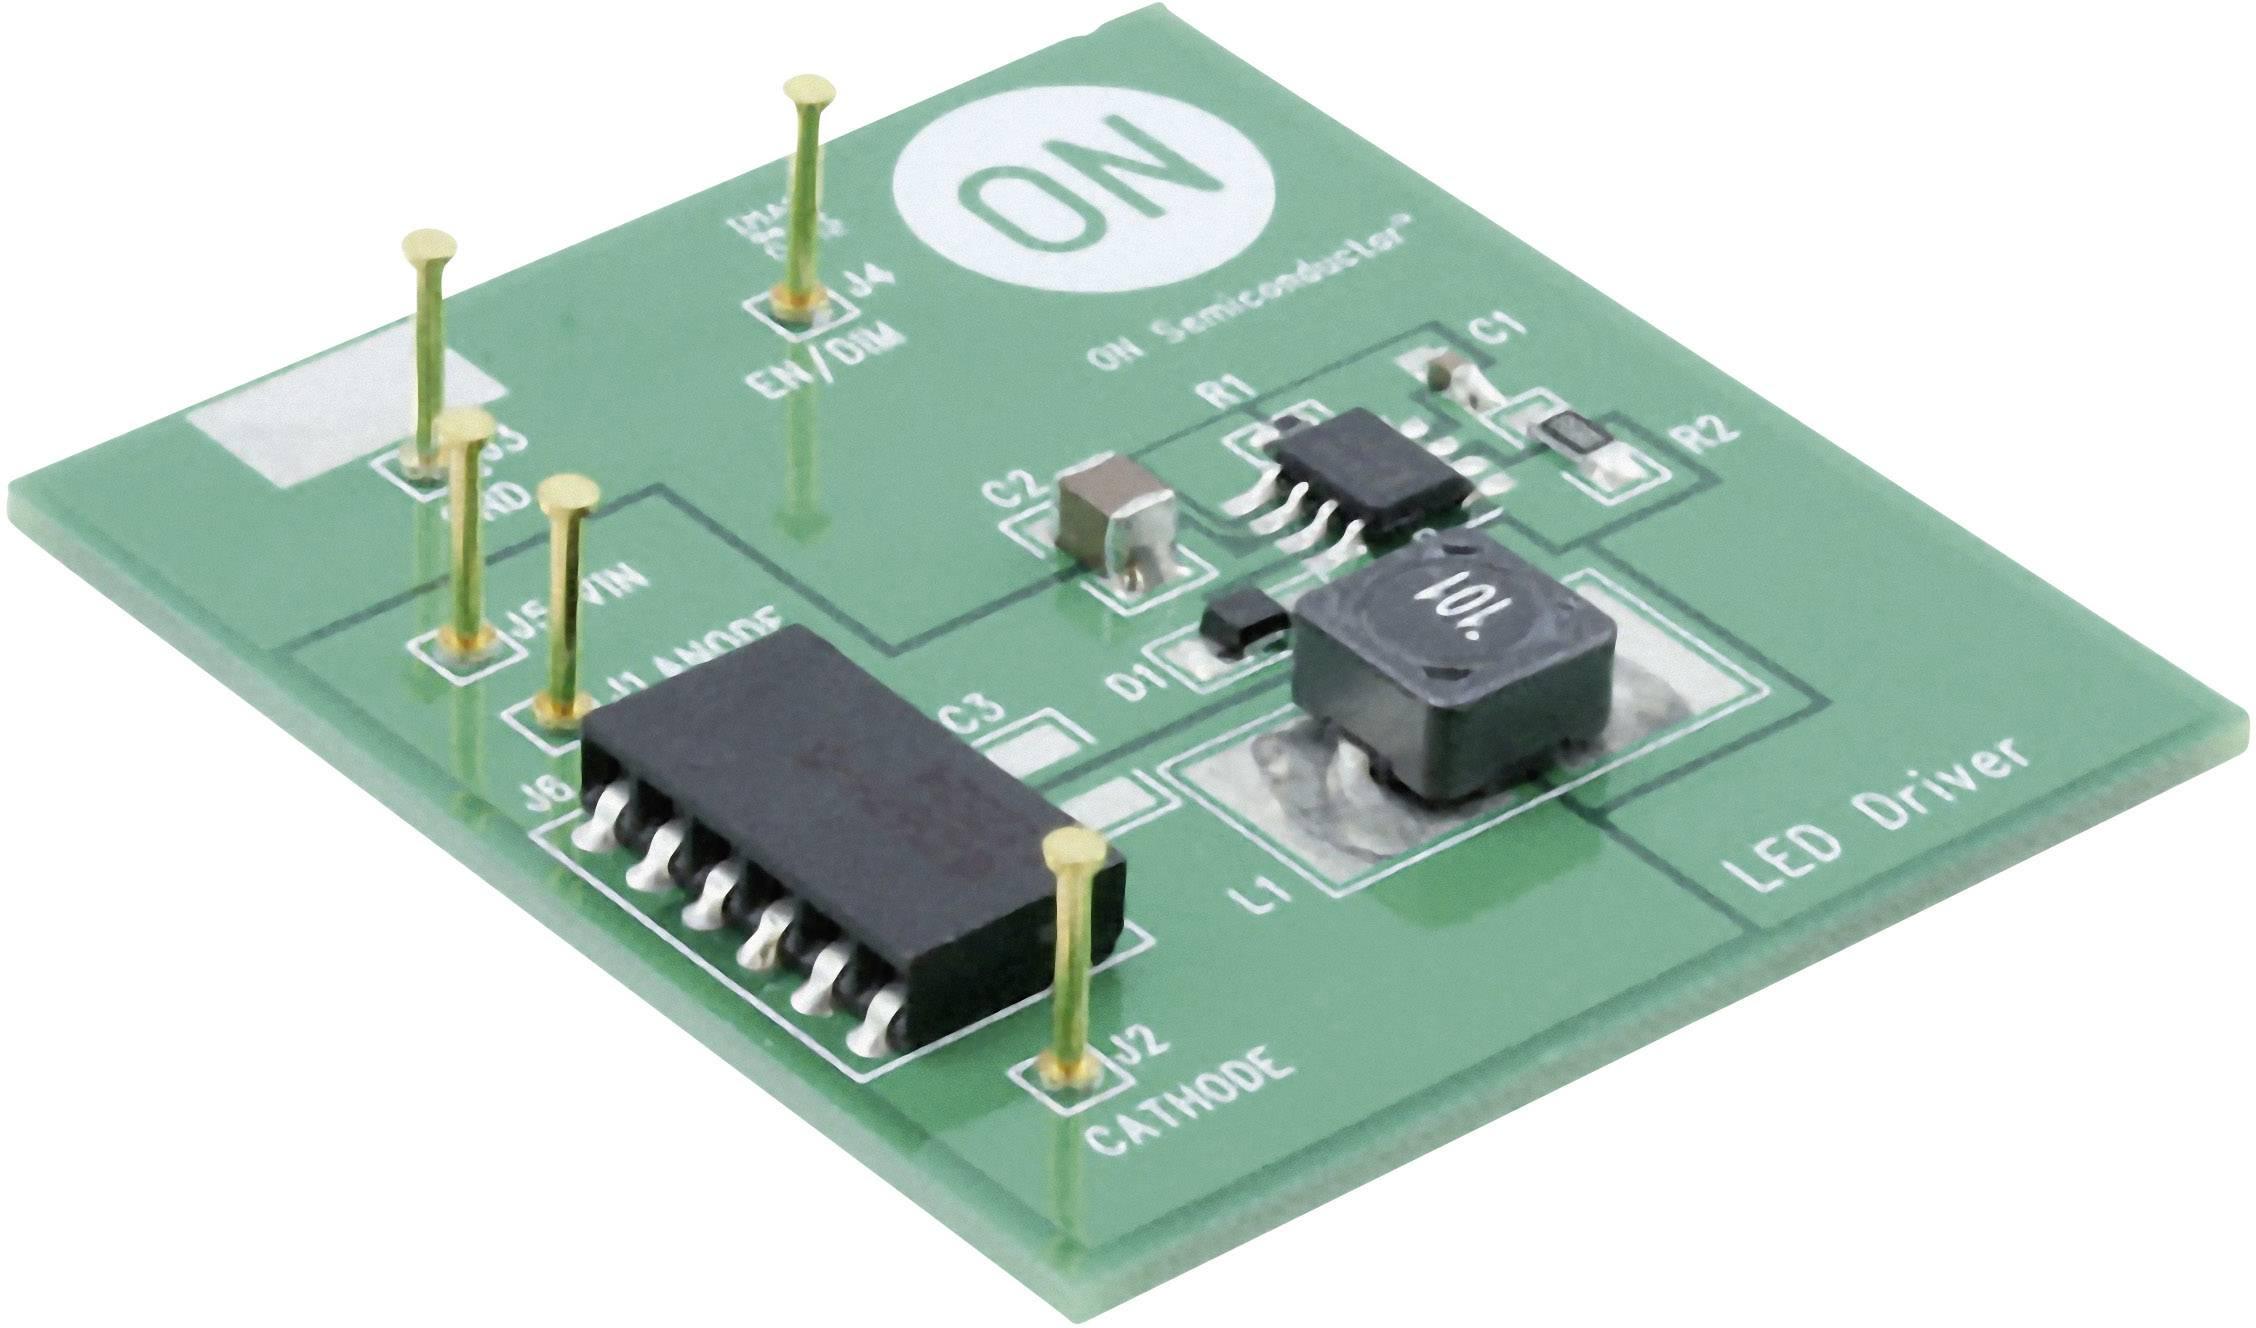 Vývojová deska ON Semiconductor NCL30160GEVB